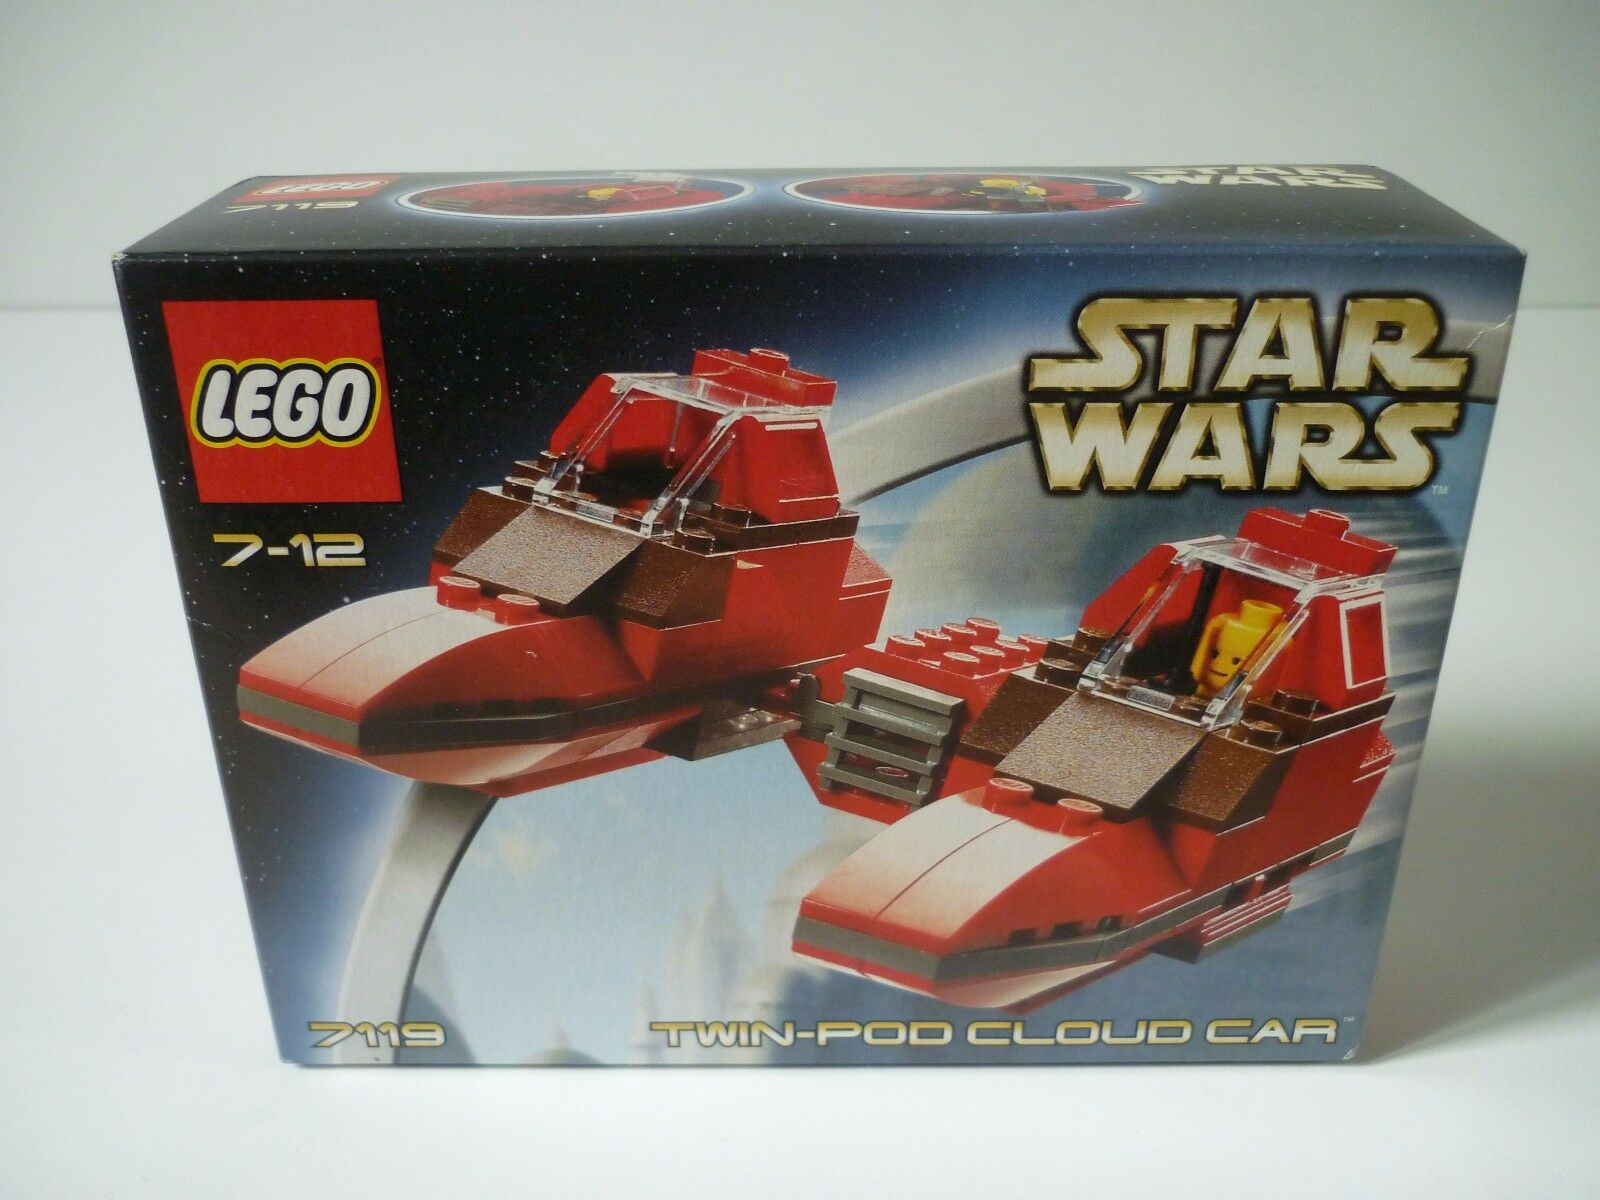 Lego Star Wars 7119 Twin-Pod Cloud Car